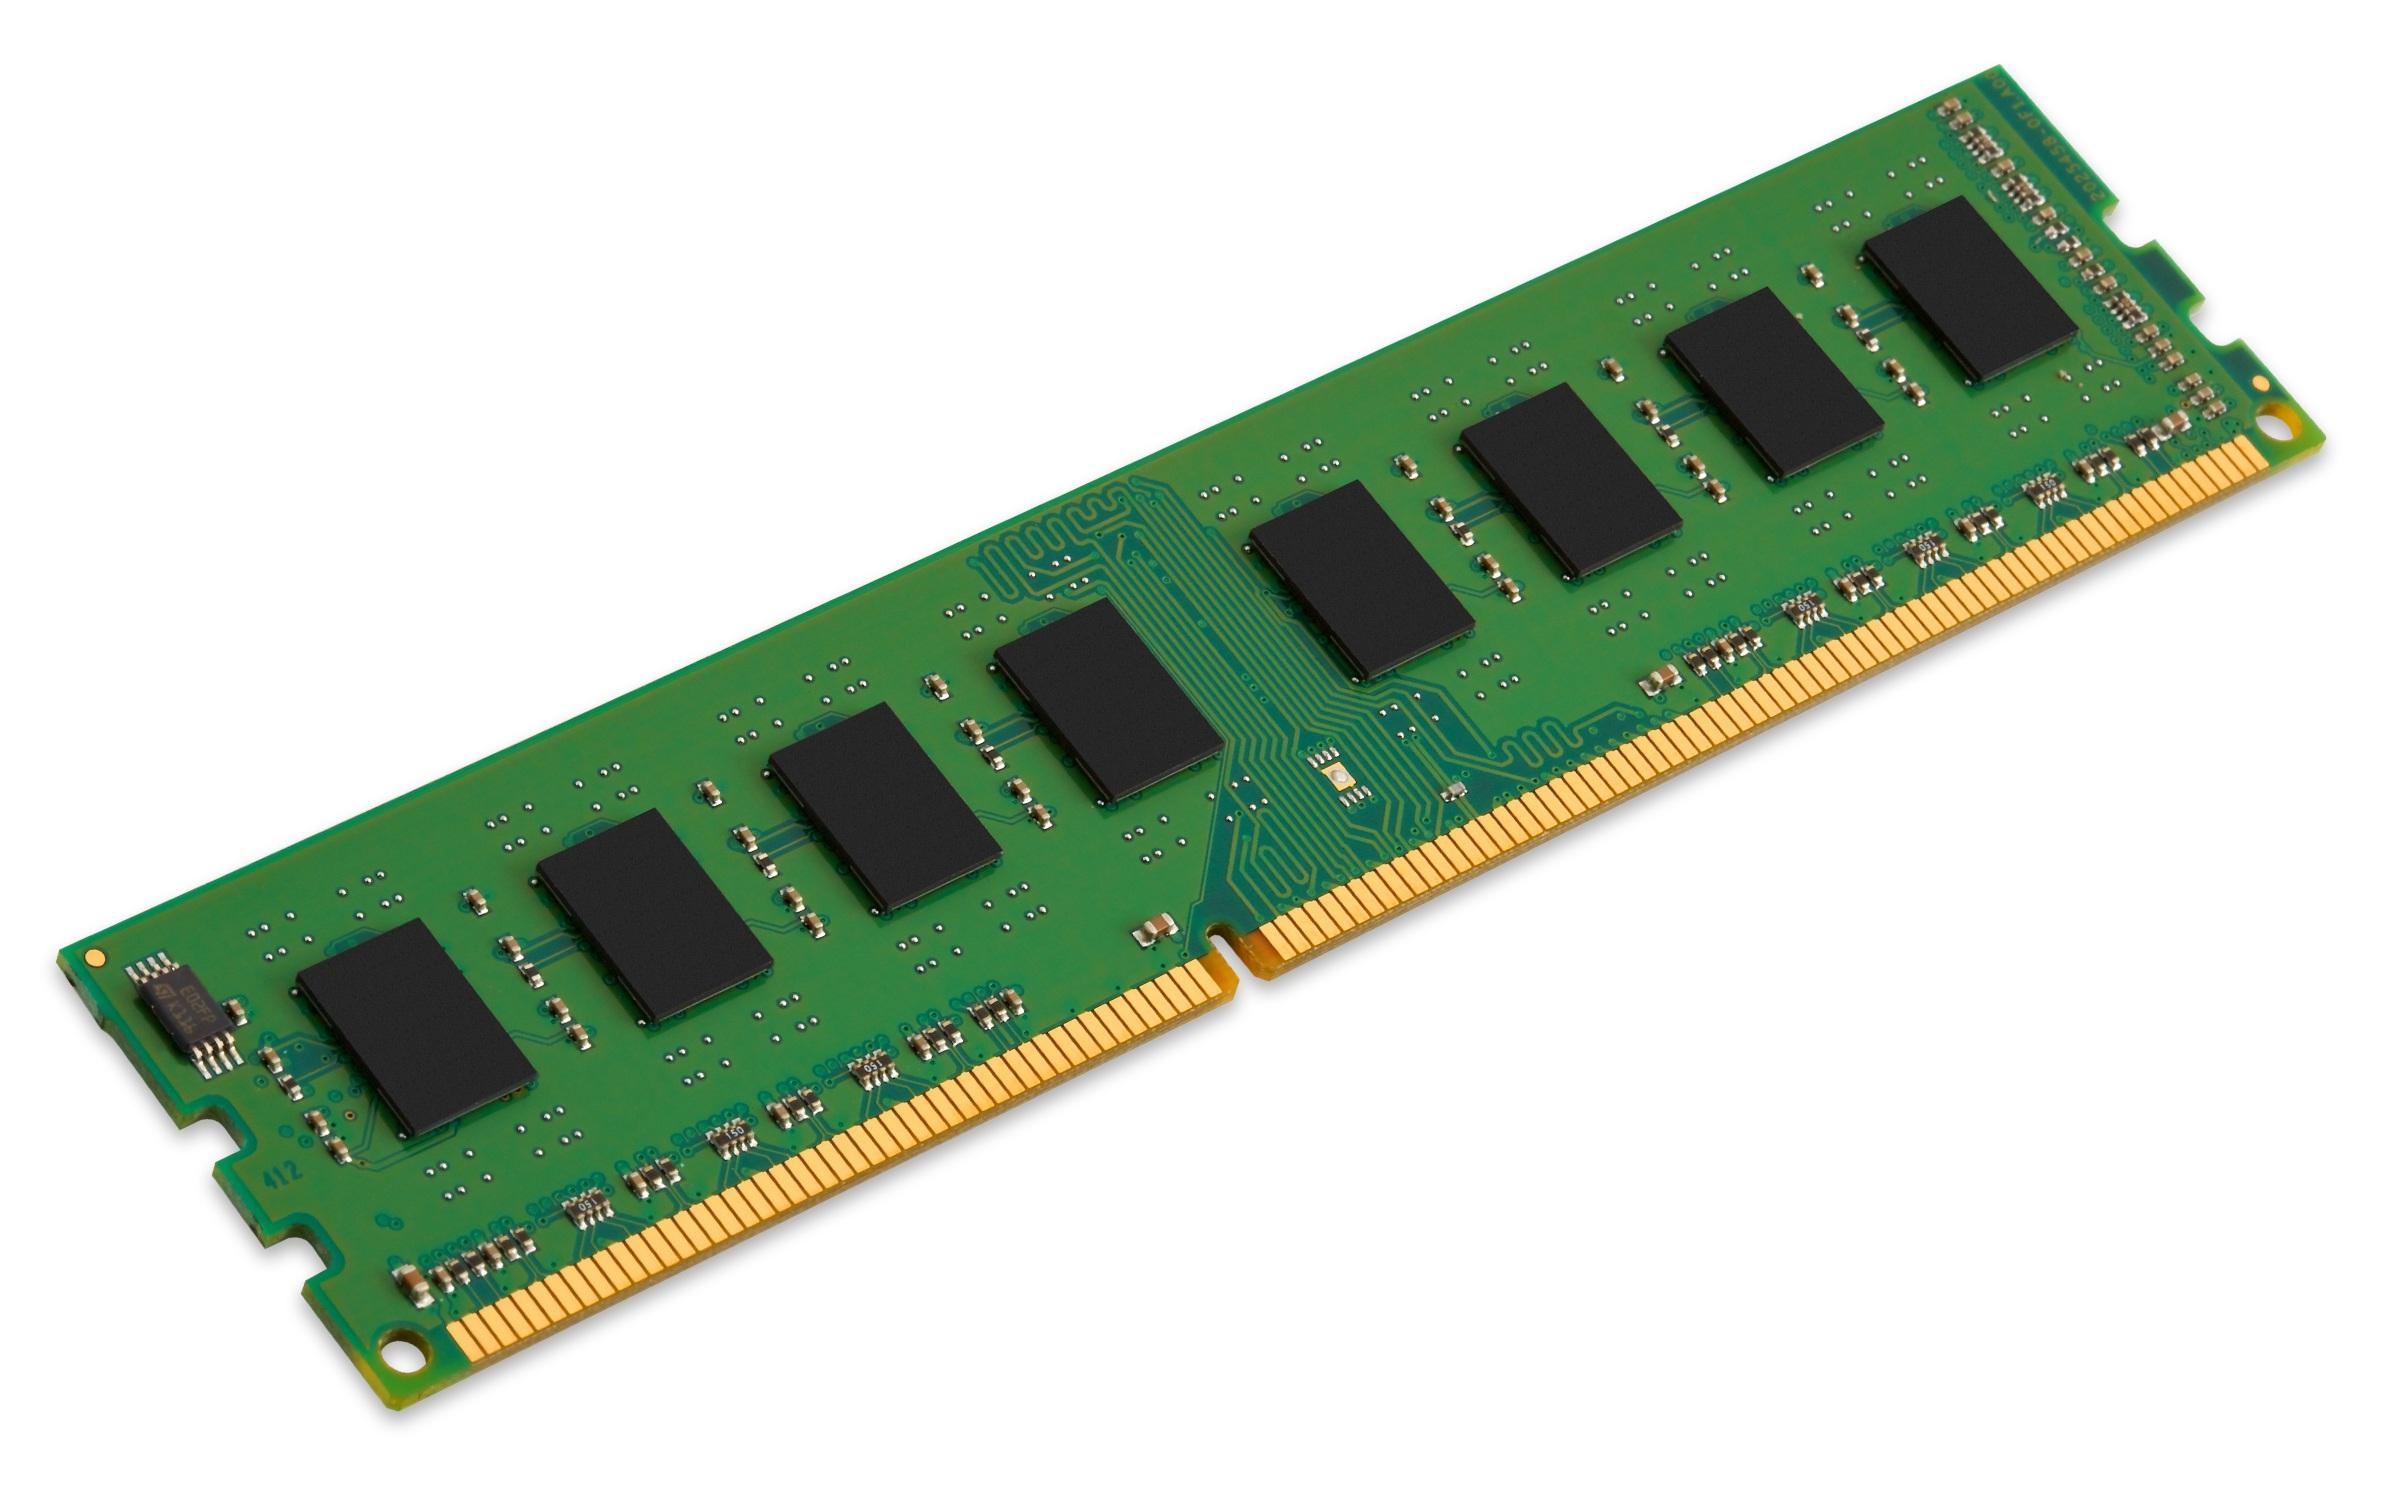 Kingston 8GB DDR3, 1600MHz, Non-ECC CL11, 2R, X8, 1.5V, Unbuffered KCP316ND8/8 - eet01